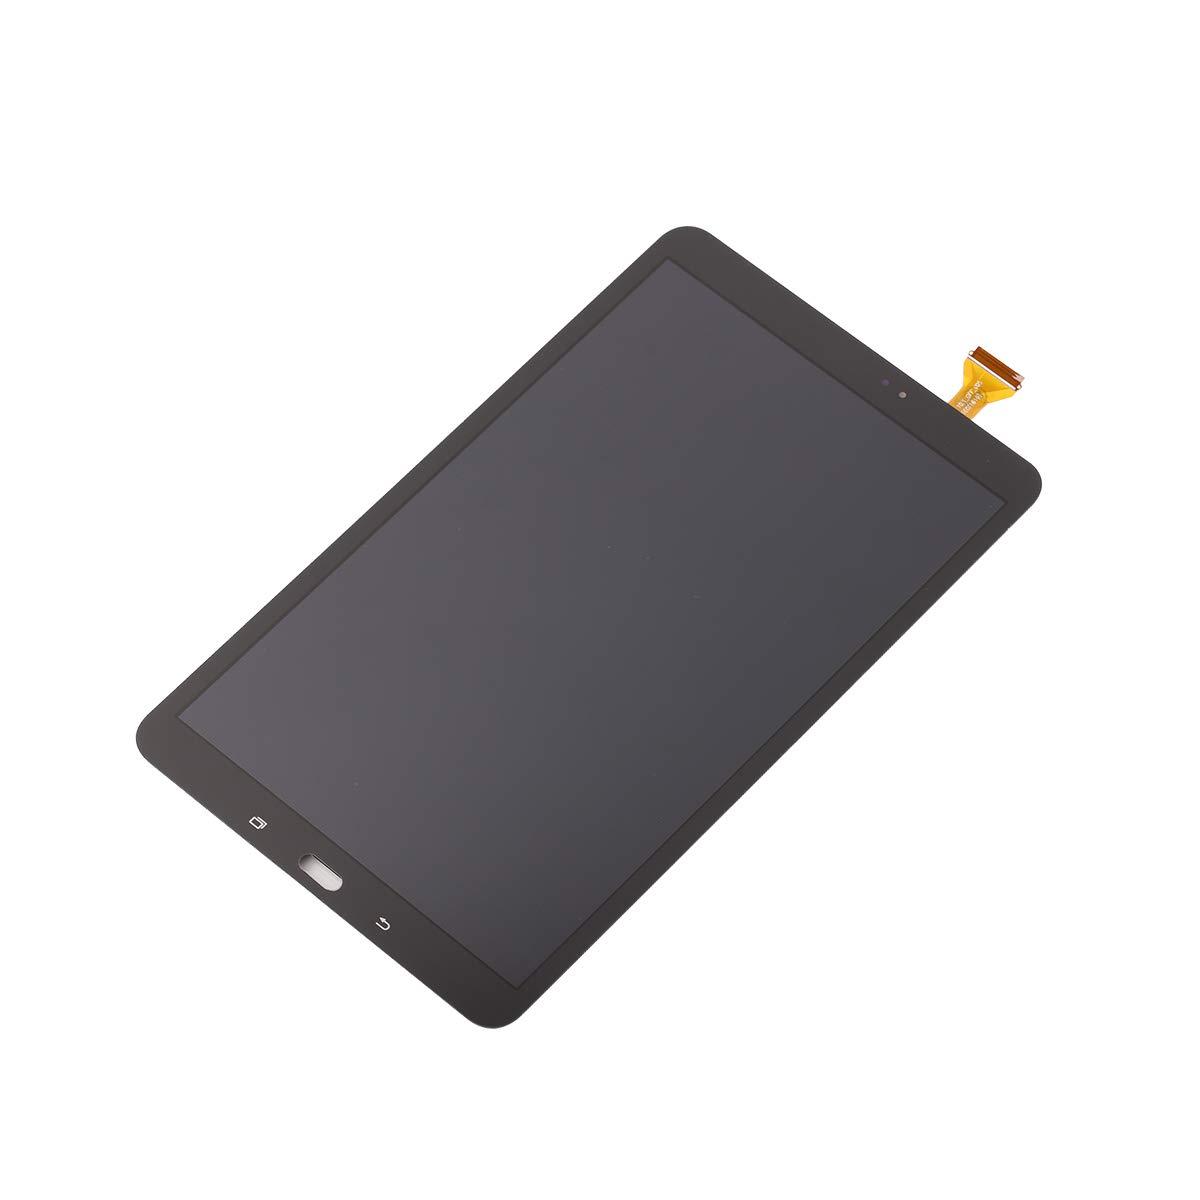 Pantalla Samsung Tab A 10.1 2016 Sm-t580 T585 T587 Negro